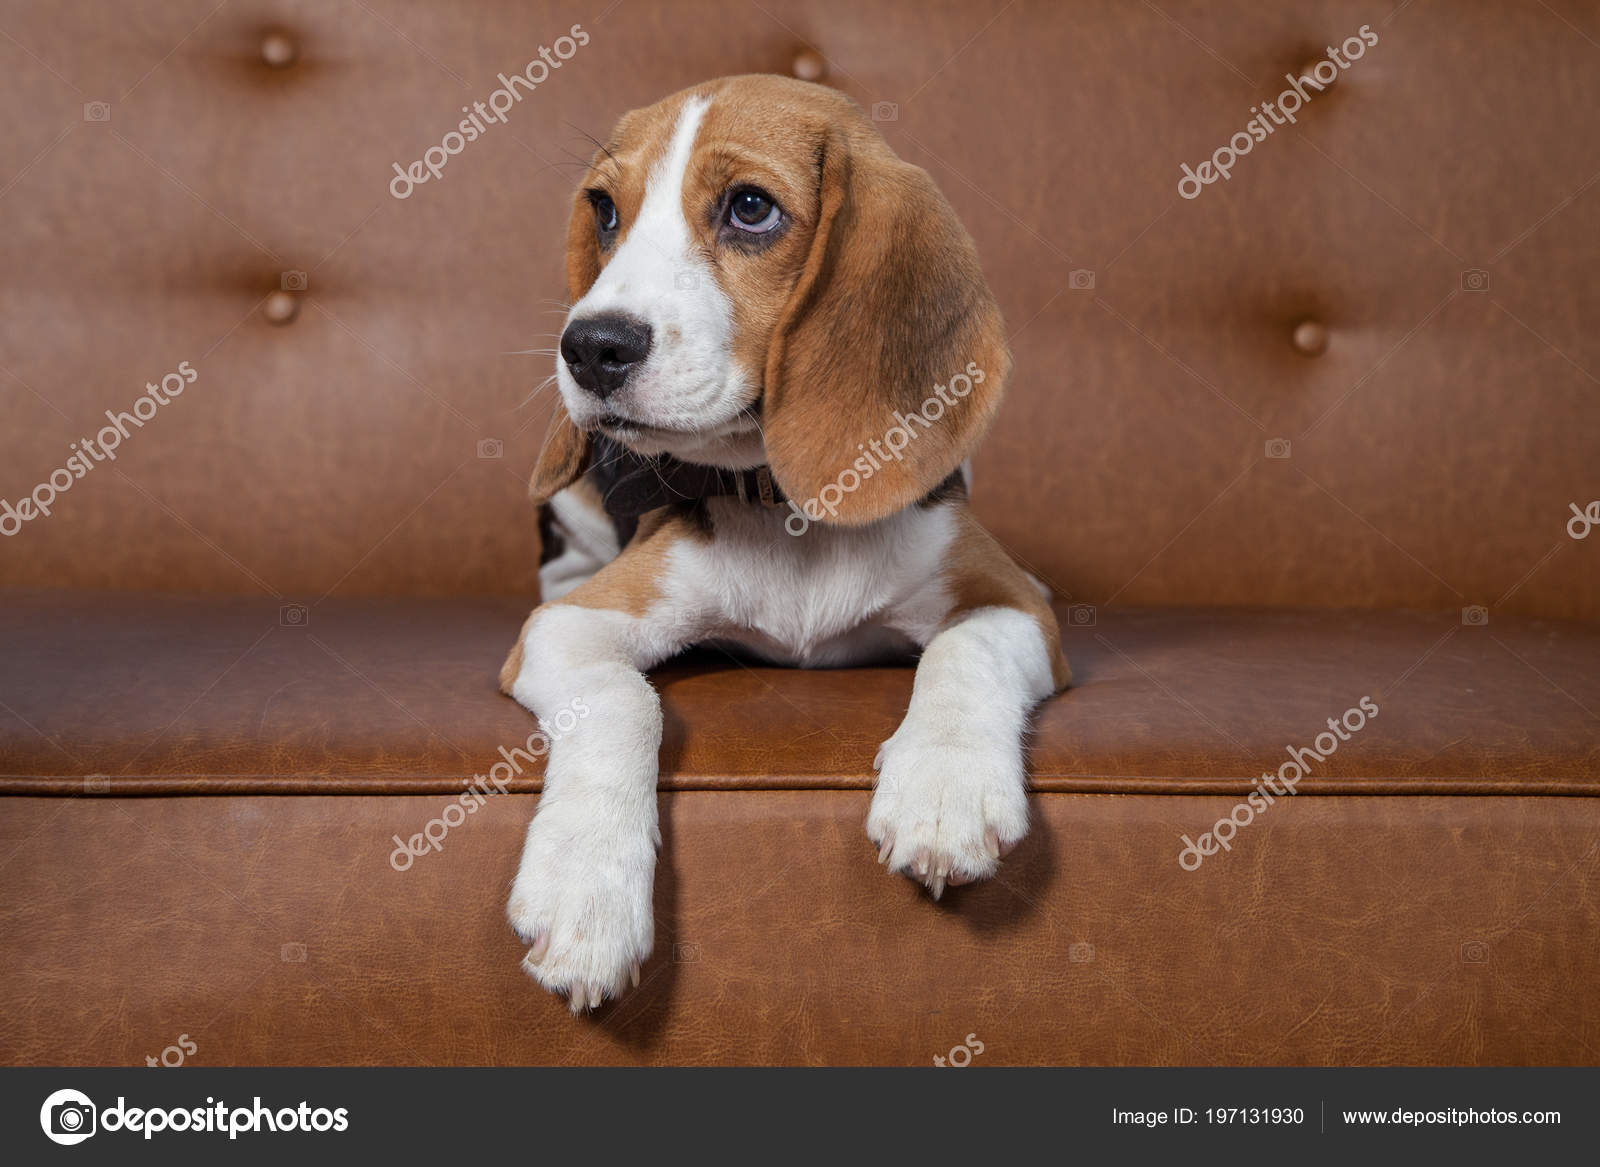 Beagle Puppy Brown Sofa Stock Photo C Aradaphotography 197131930